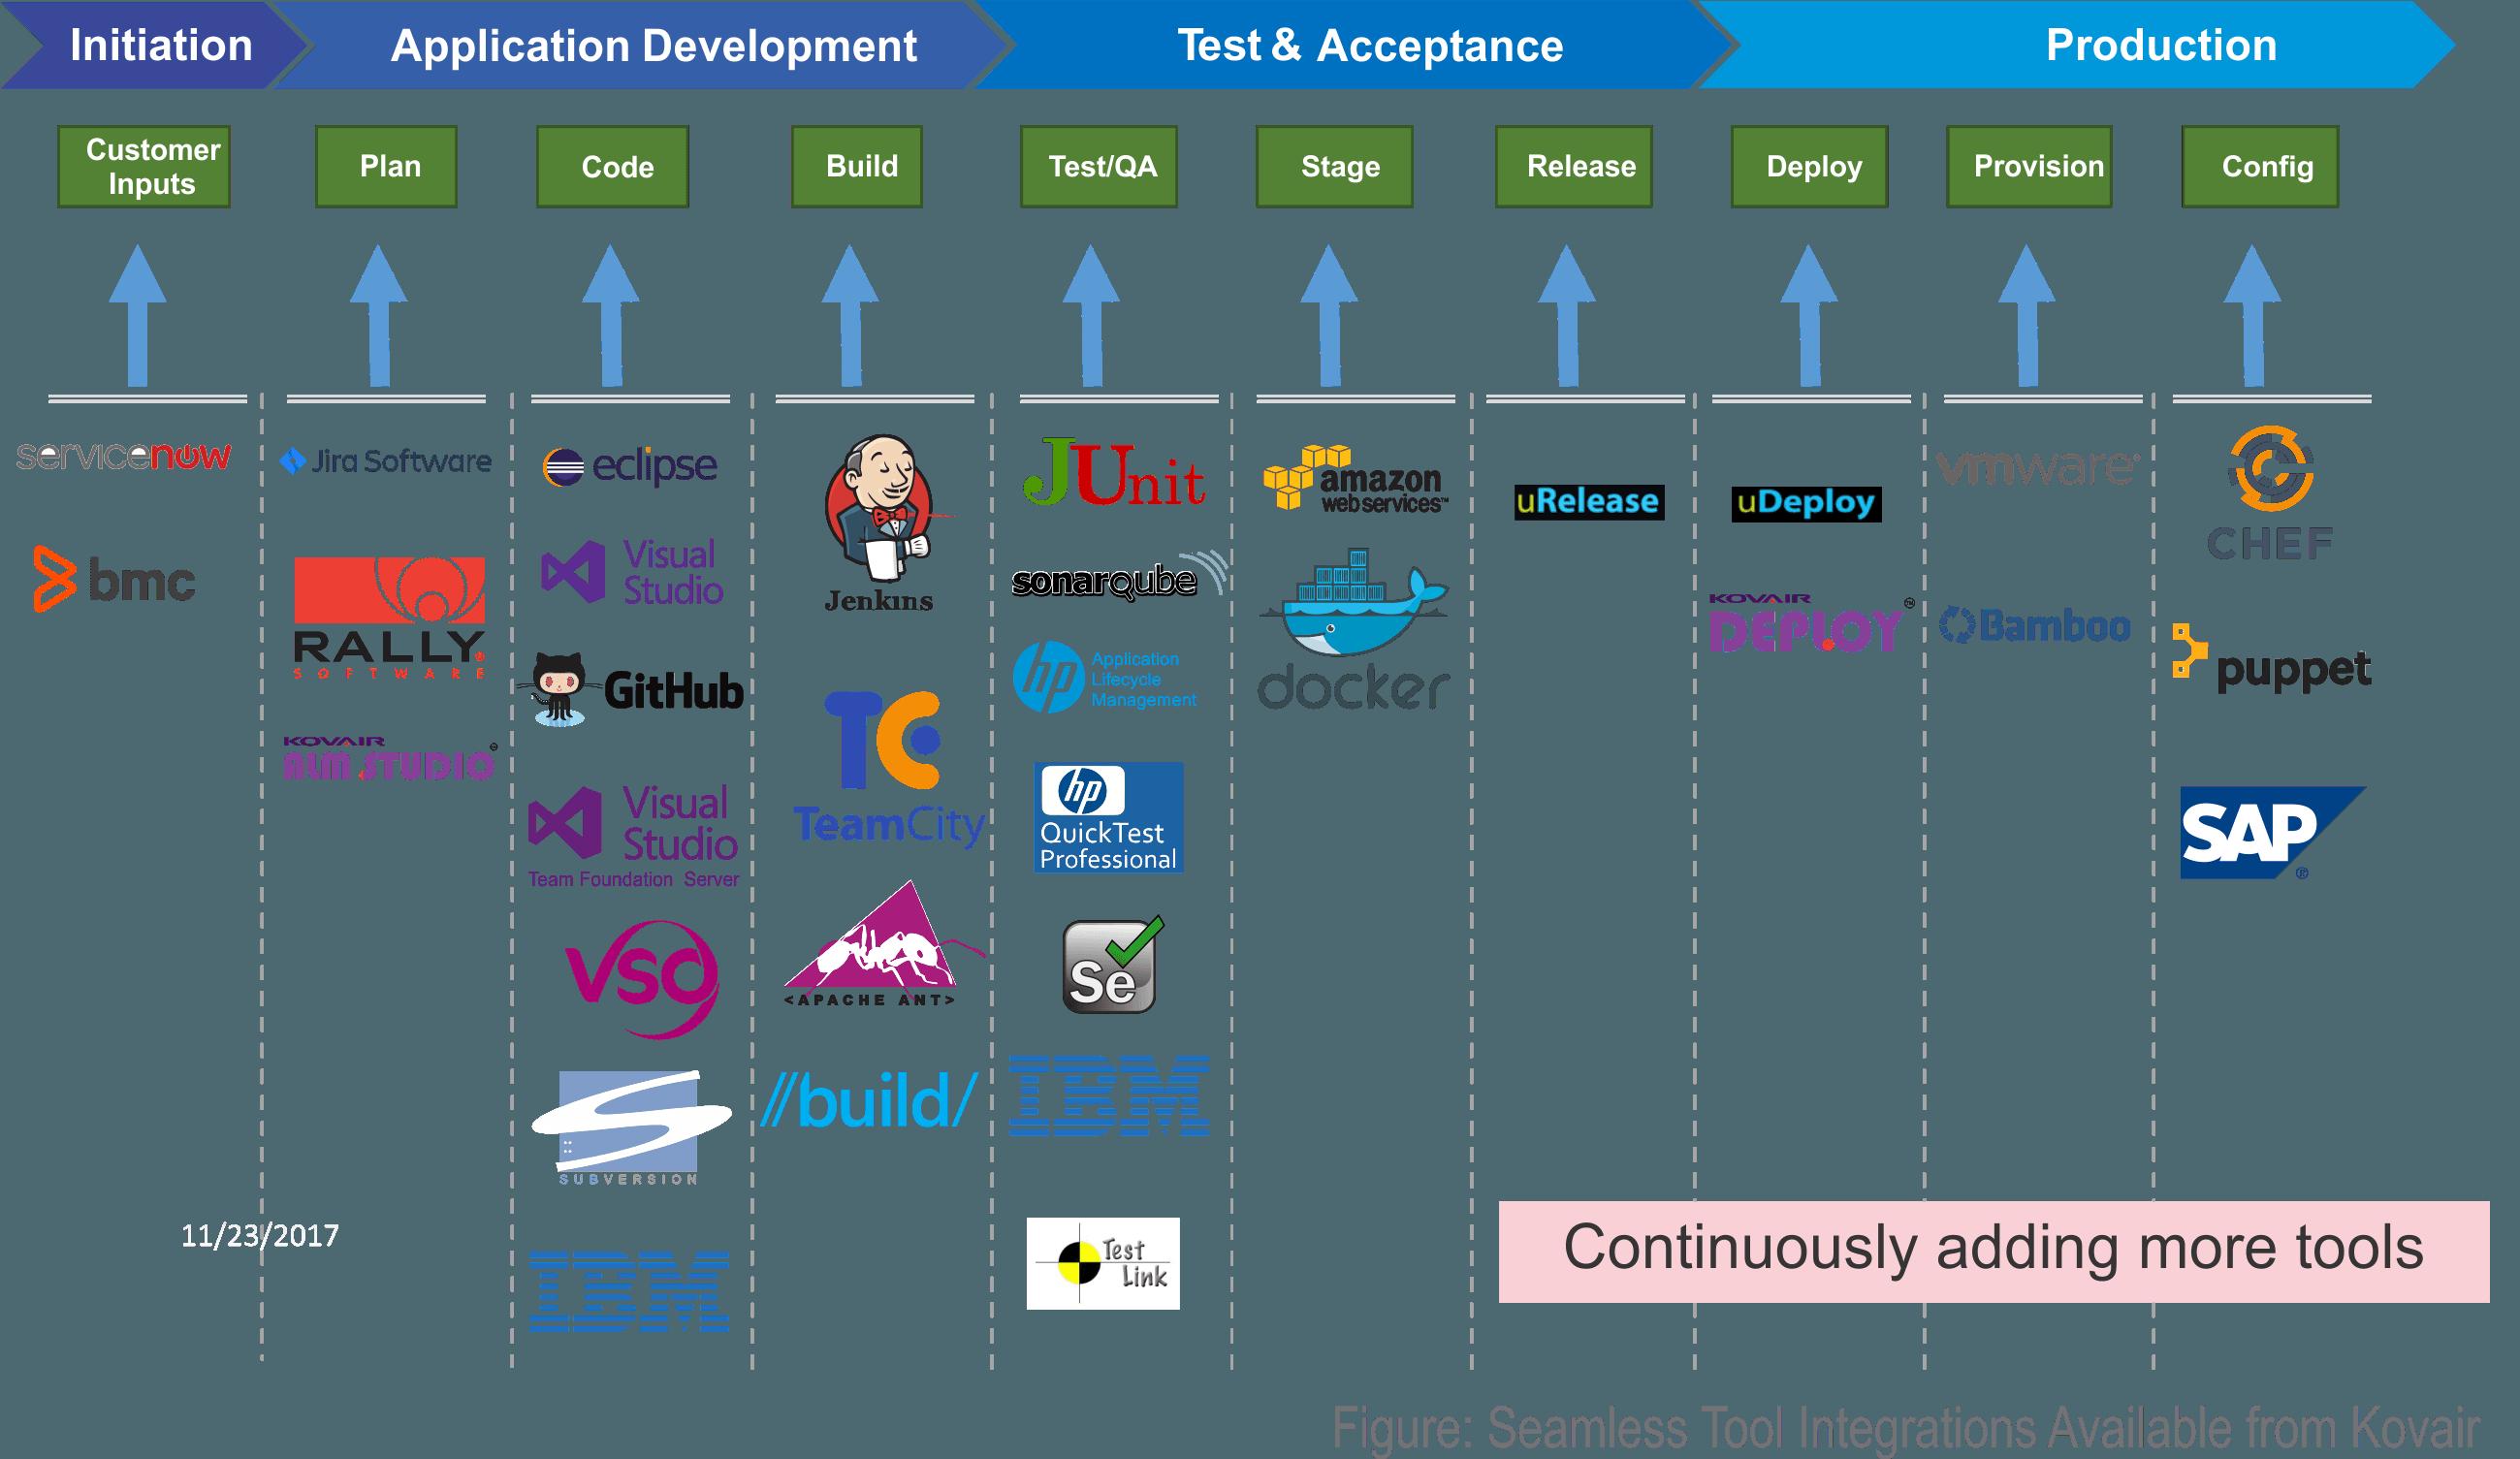 Omnibus Integrations Supporting DevOps